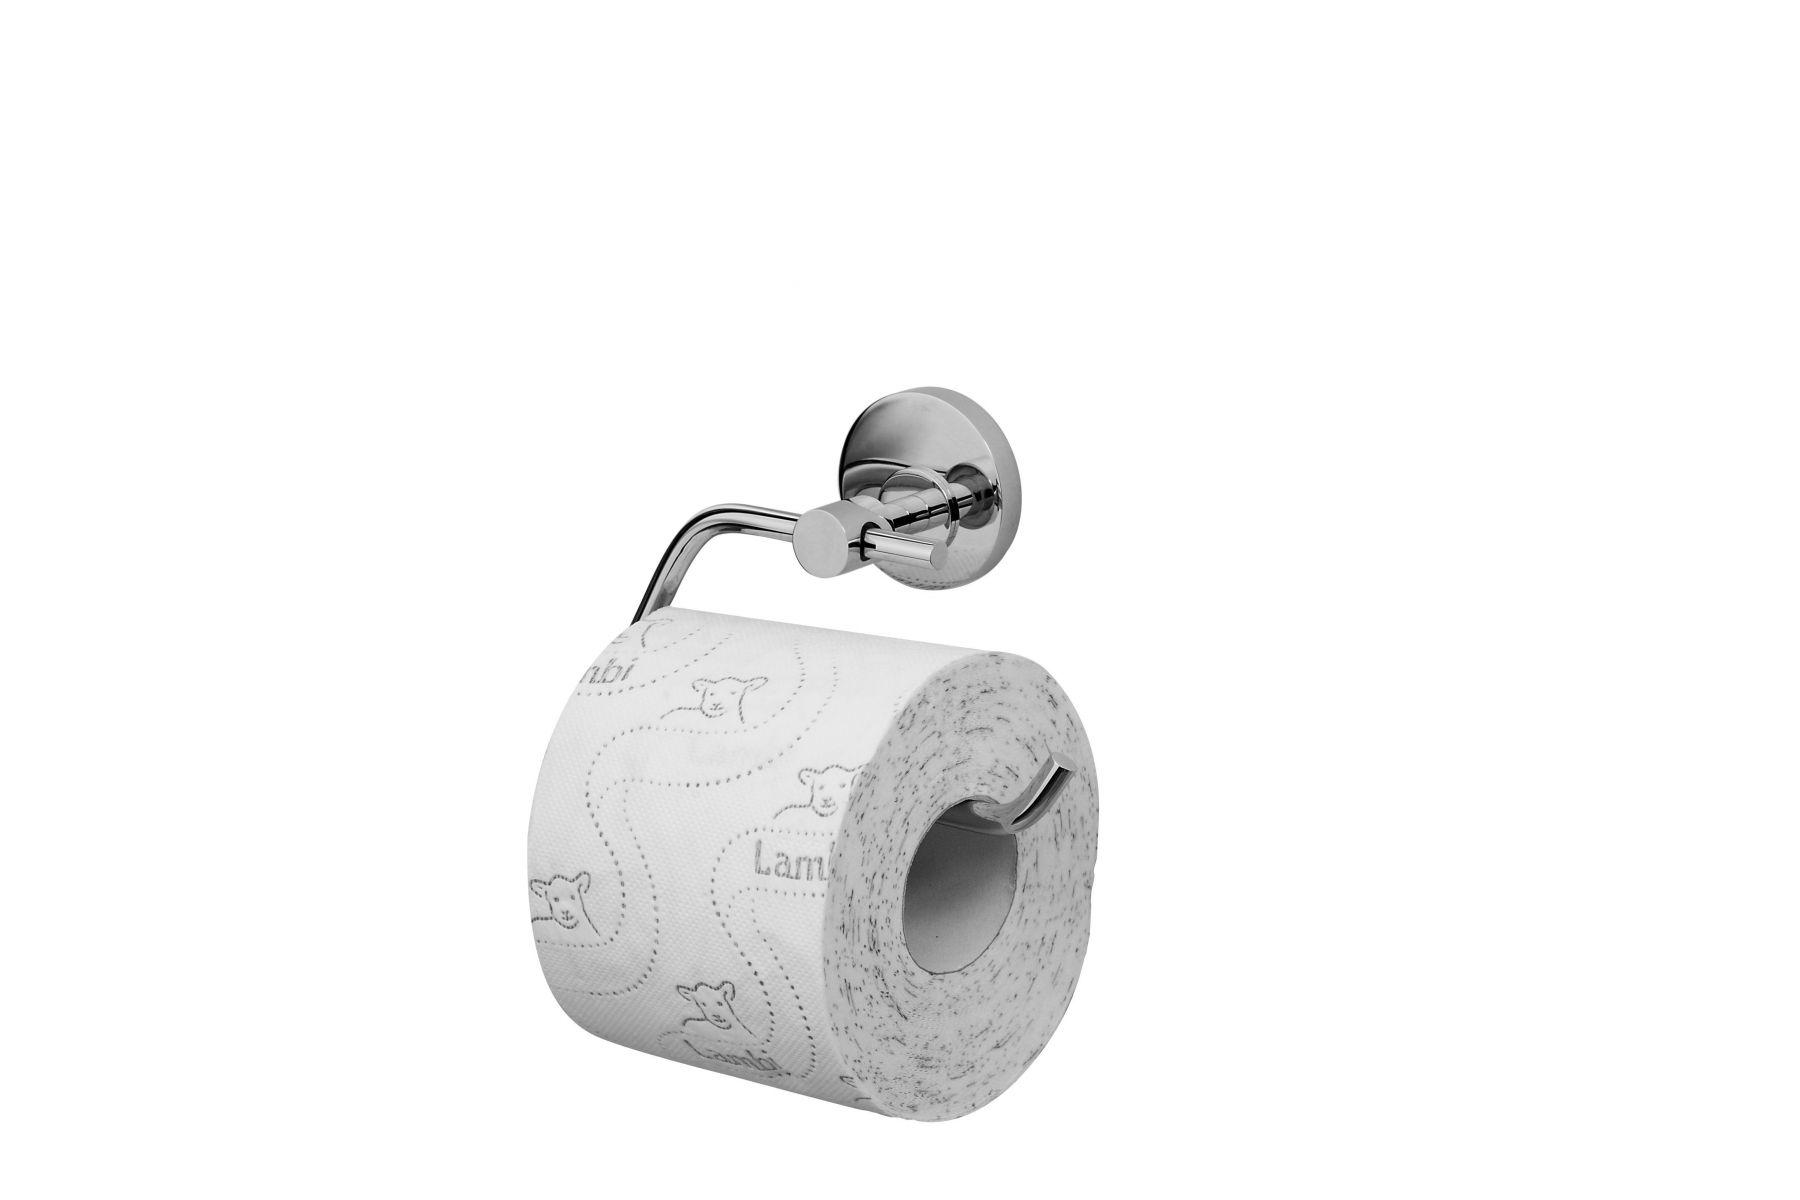 Туалетный бумагодержатель Am.Pm Bliss L A5534164 ФОТО